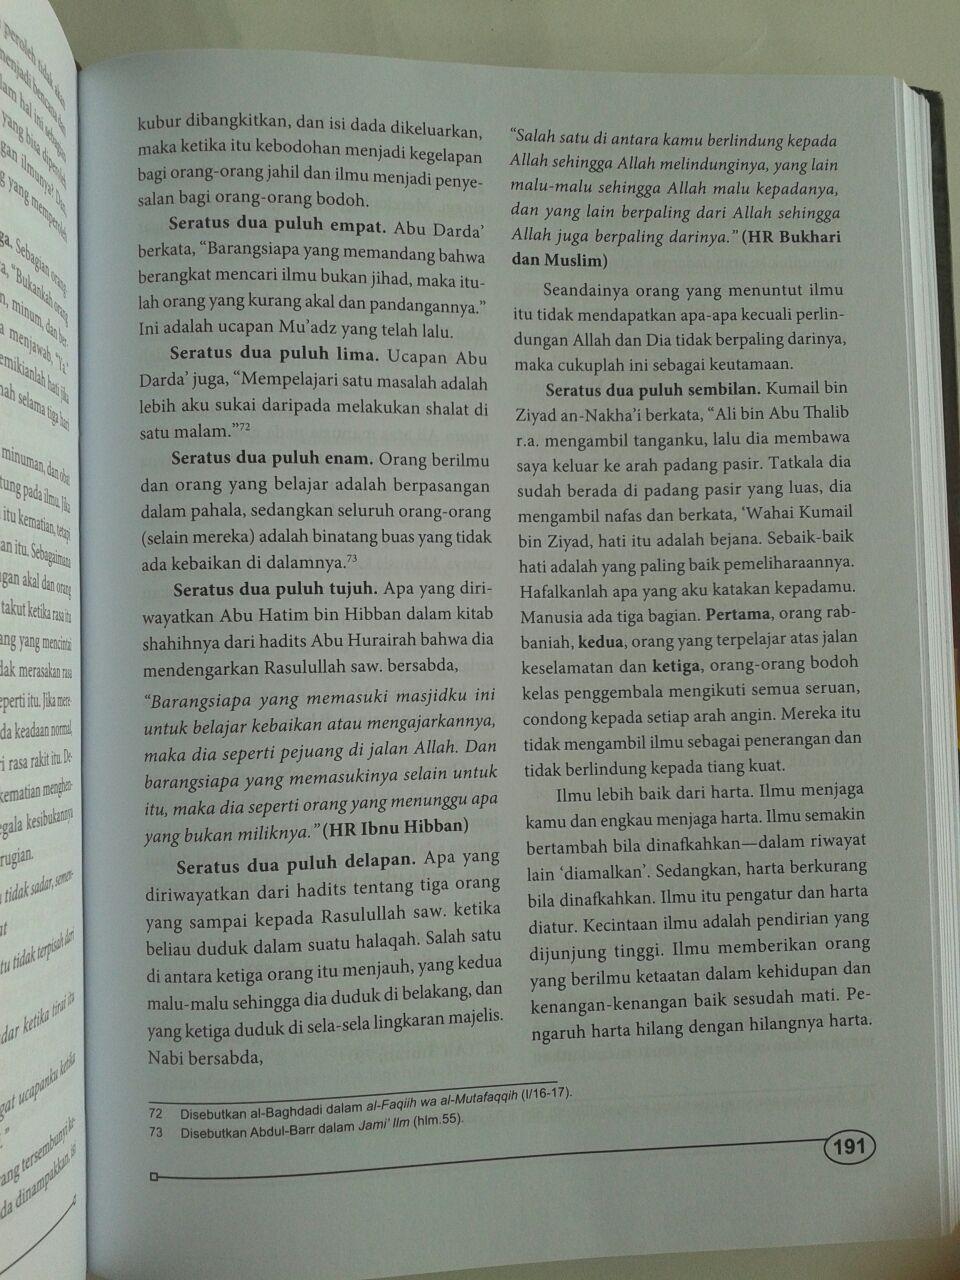 Buku Kunci Kebahagiaan isi 2